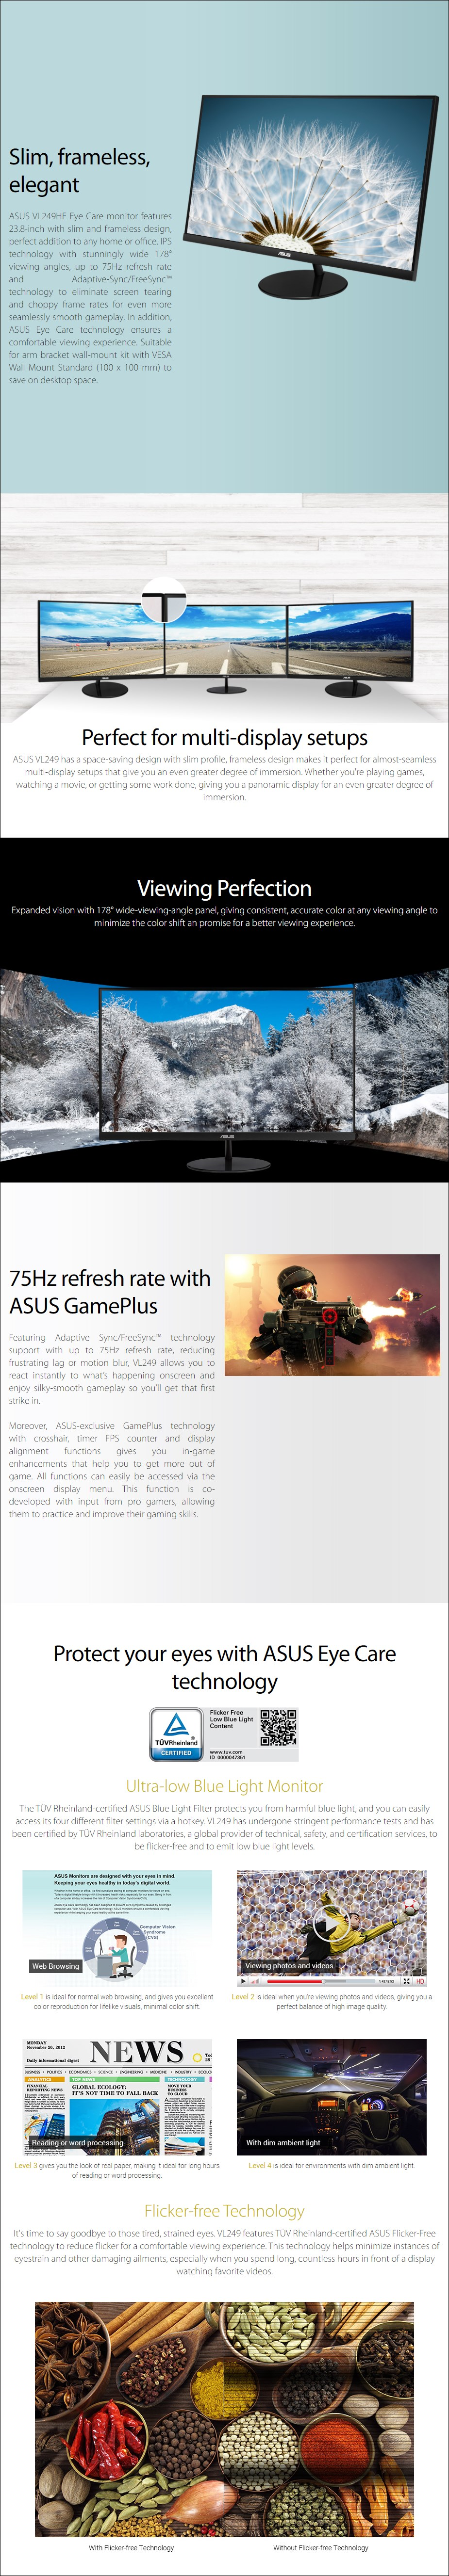 asus-vl249he-238-75hz-full-hd-freesync-eye-care-ips-monitor-ac27427-5.jpg